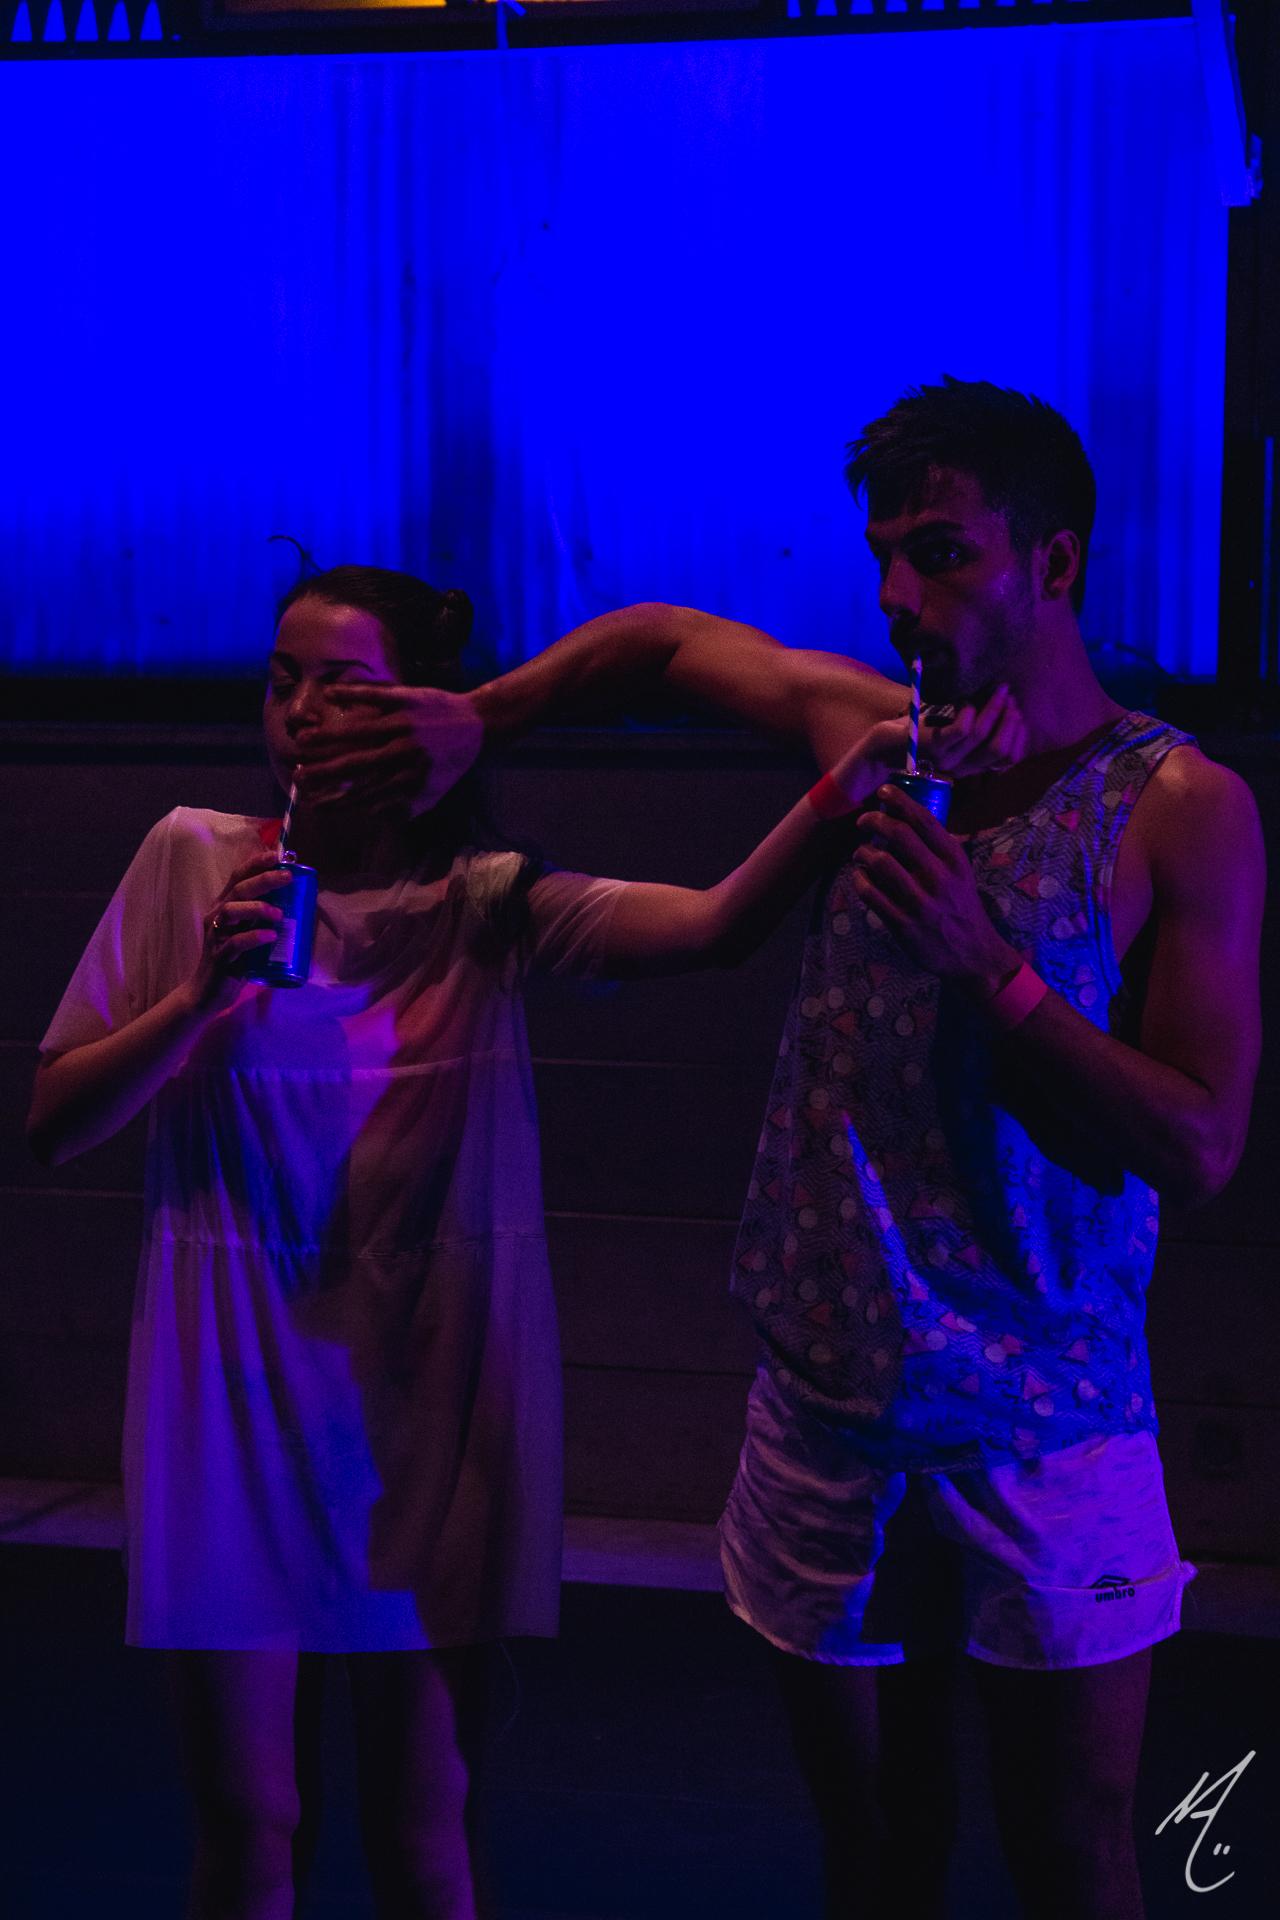 Dancers: Peyton Cunningham, Clay Moore